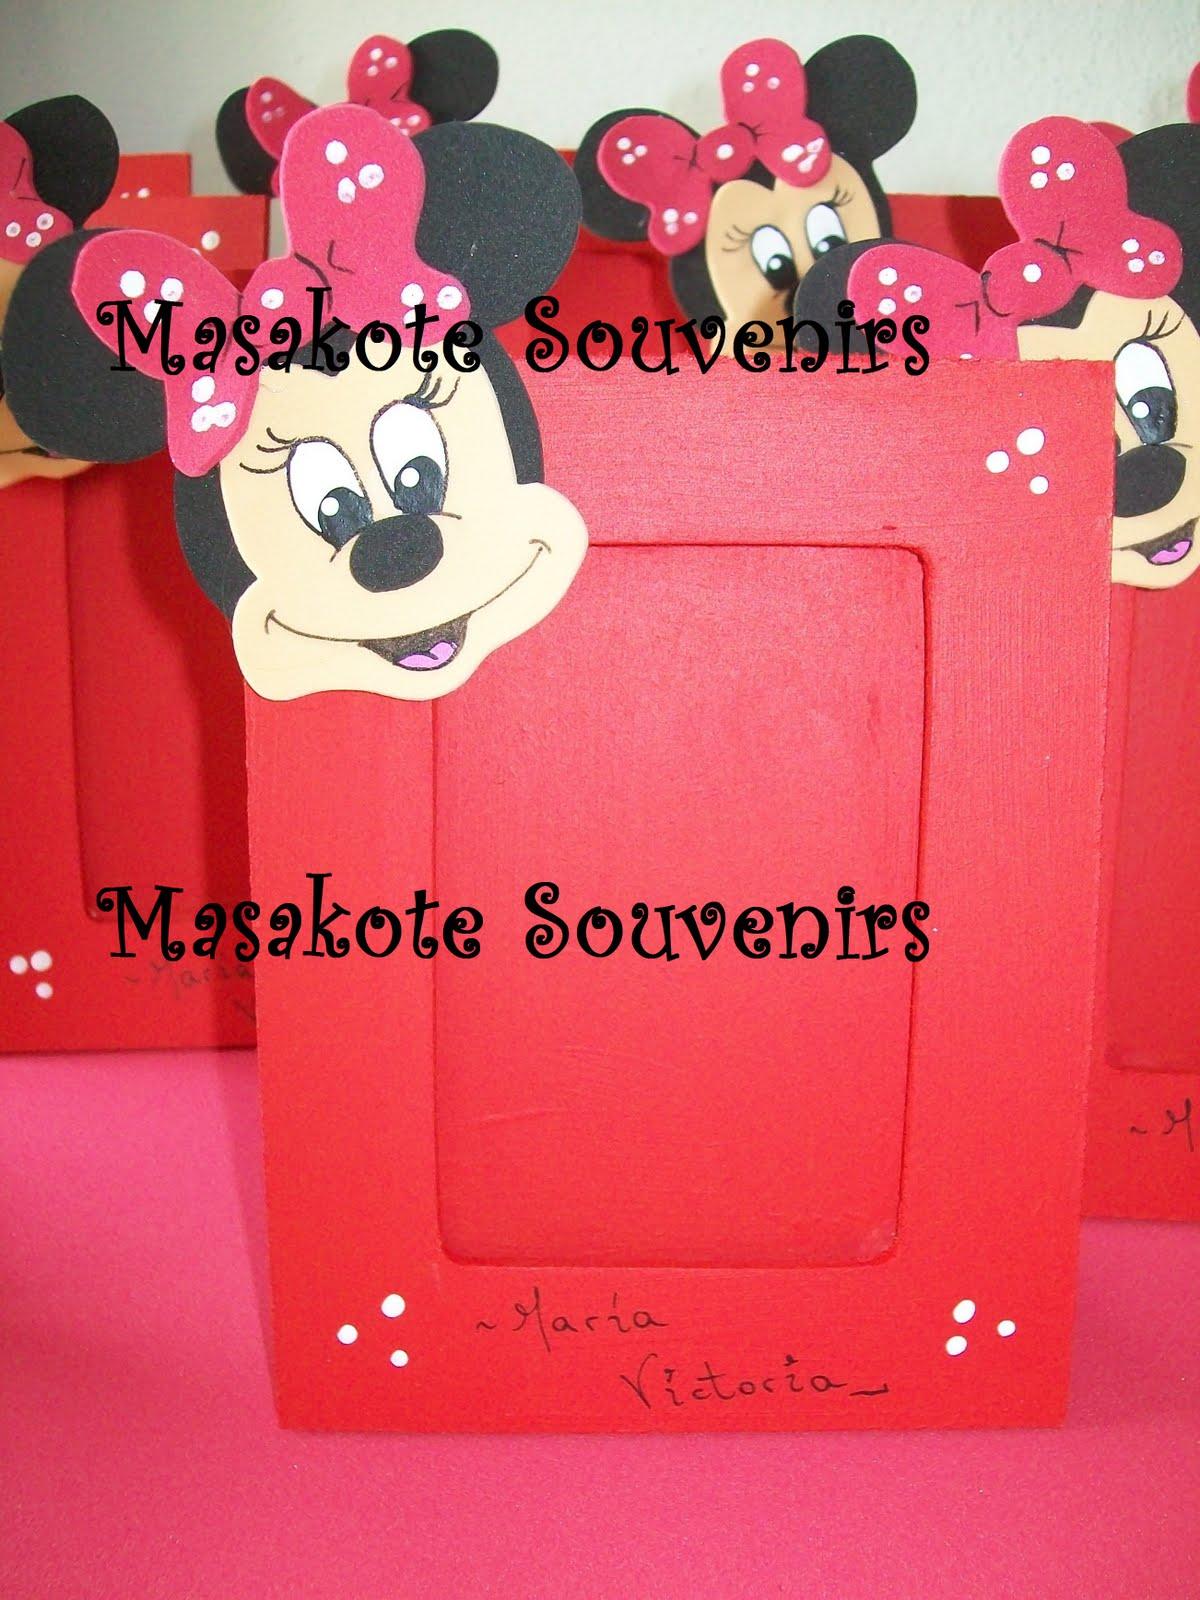 Masakote Souvenirs Infantiles: Souvenirs Portaretratos